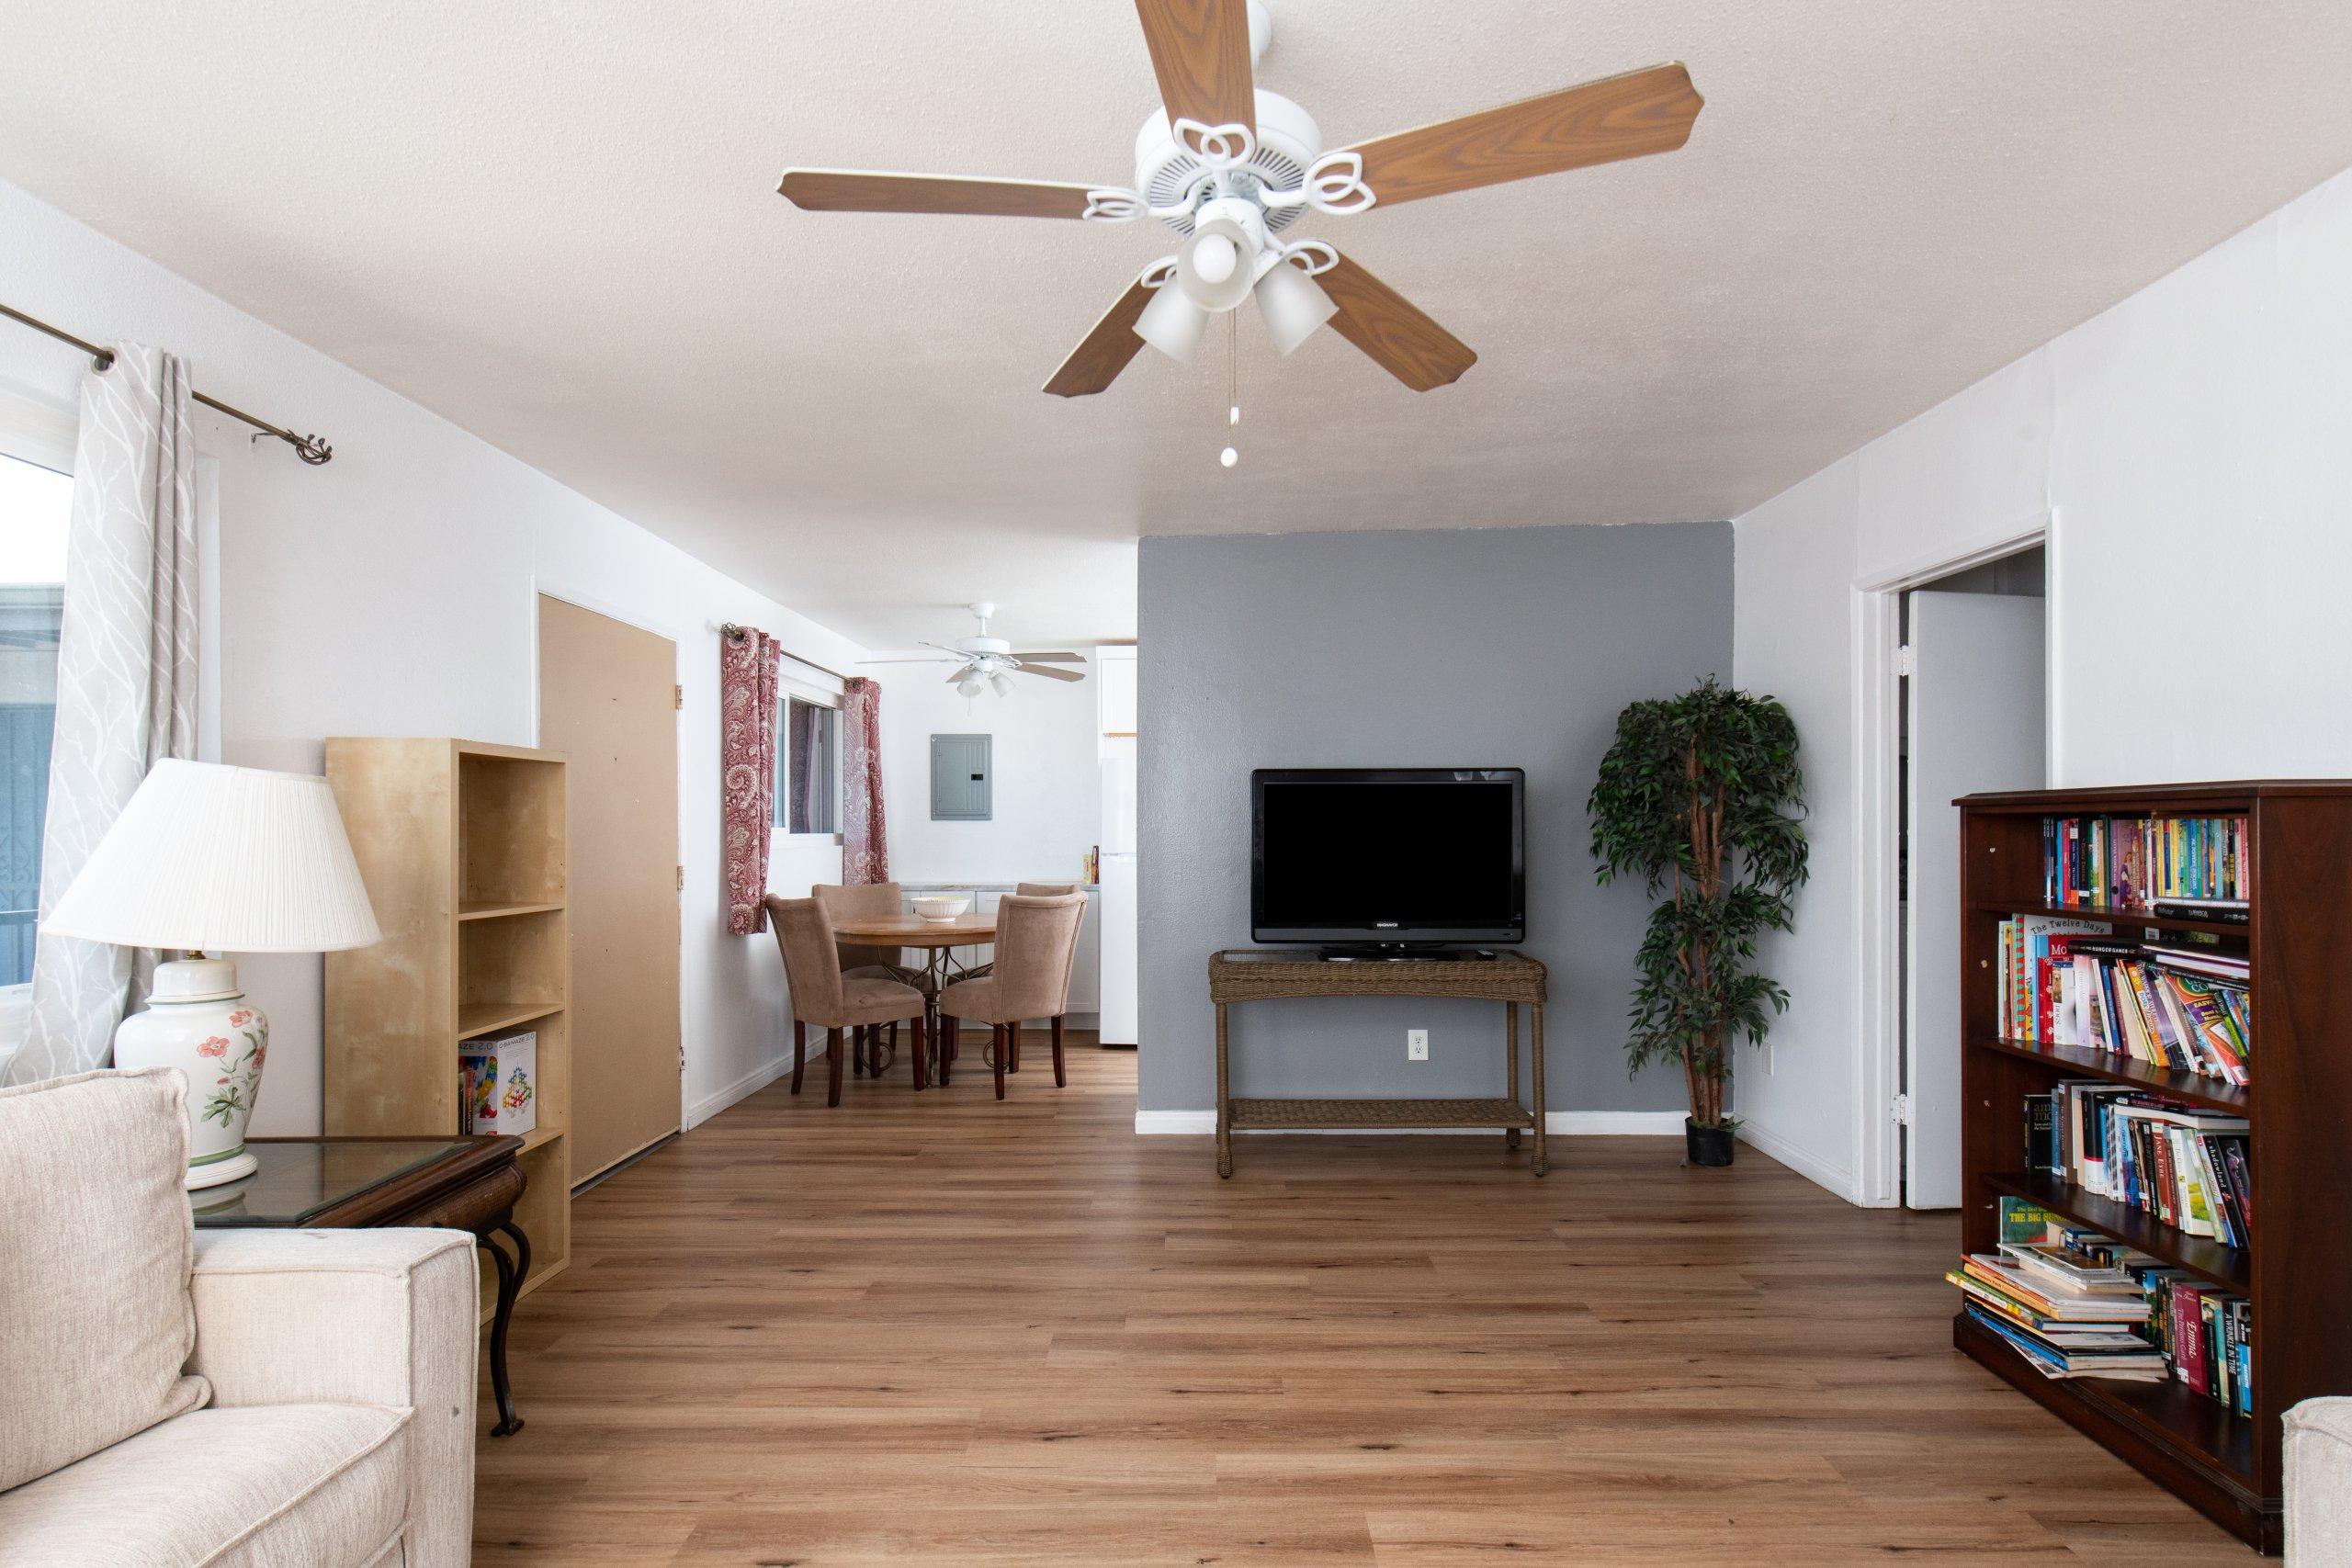 Galleher-flooring-in-Thomas-House-Remodel